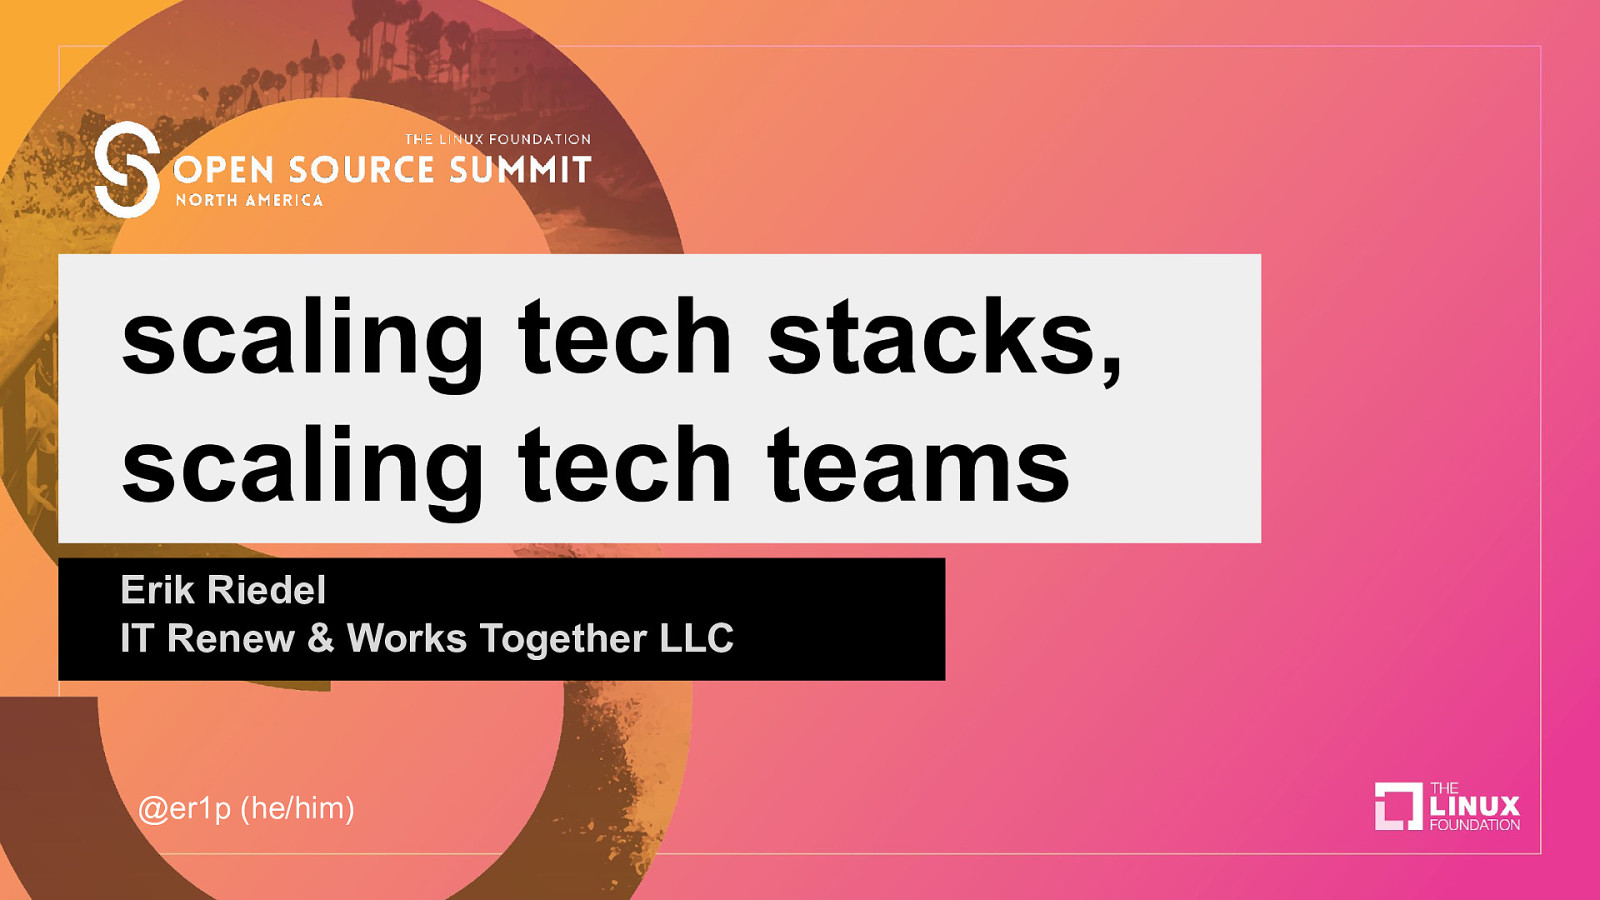 scaling tech stacks, scaling tech teams